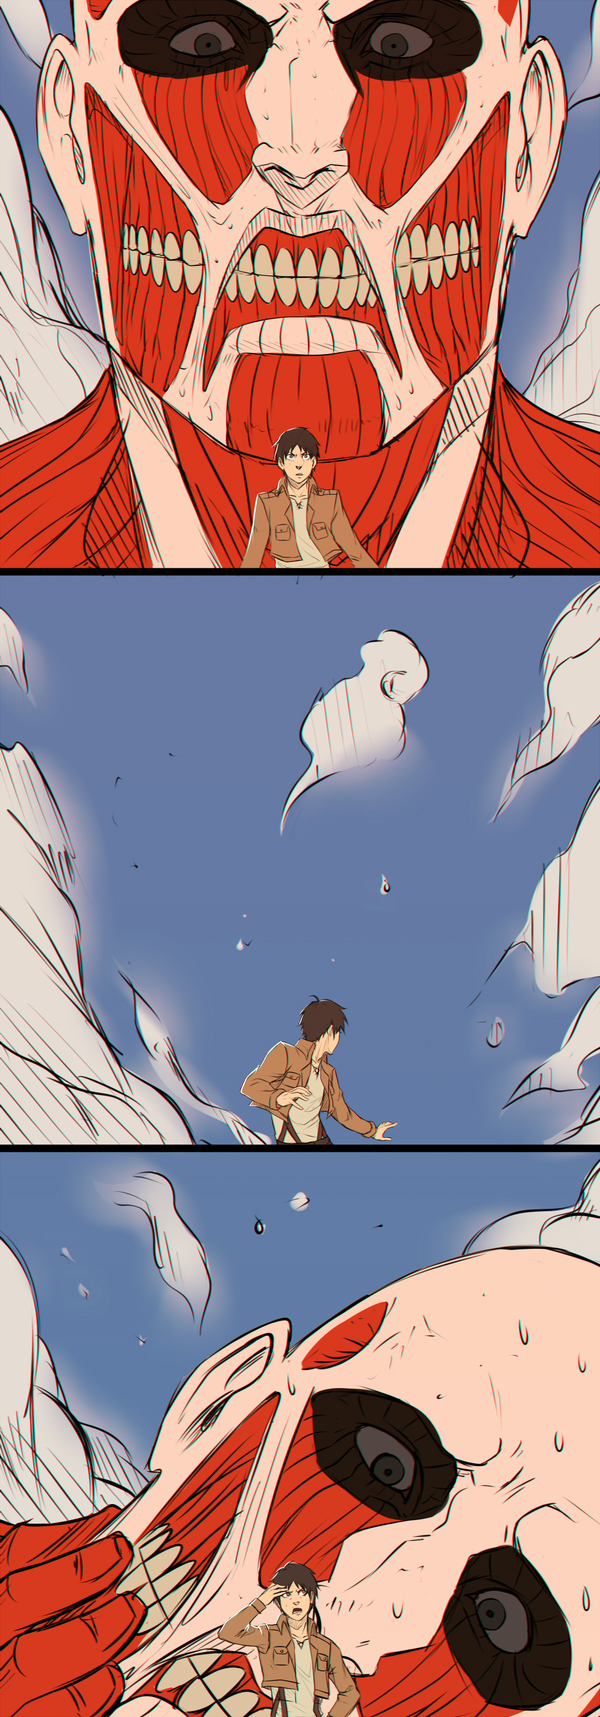 Tags: Anime, Pixiv Id 8160433, Moni158, Attack on Titan, Titan (Shingeki no Kyojin), Eren Jaeger, Colossal Titan, Comic, Pixiv